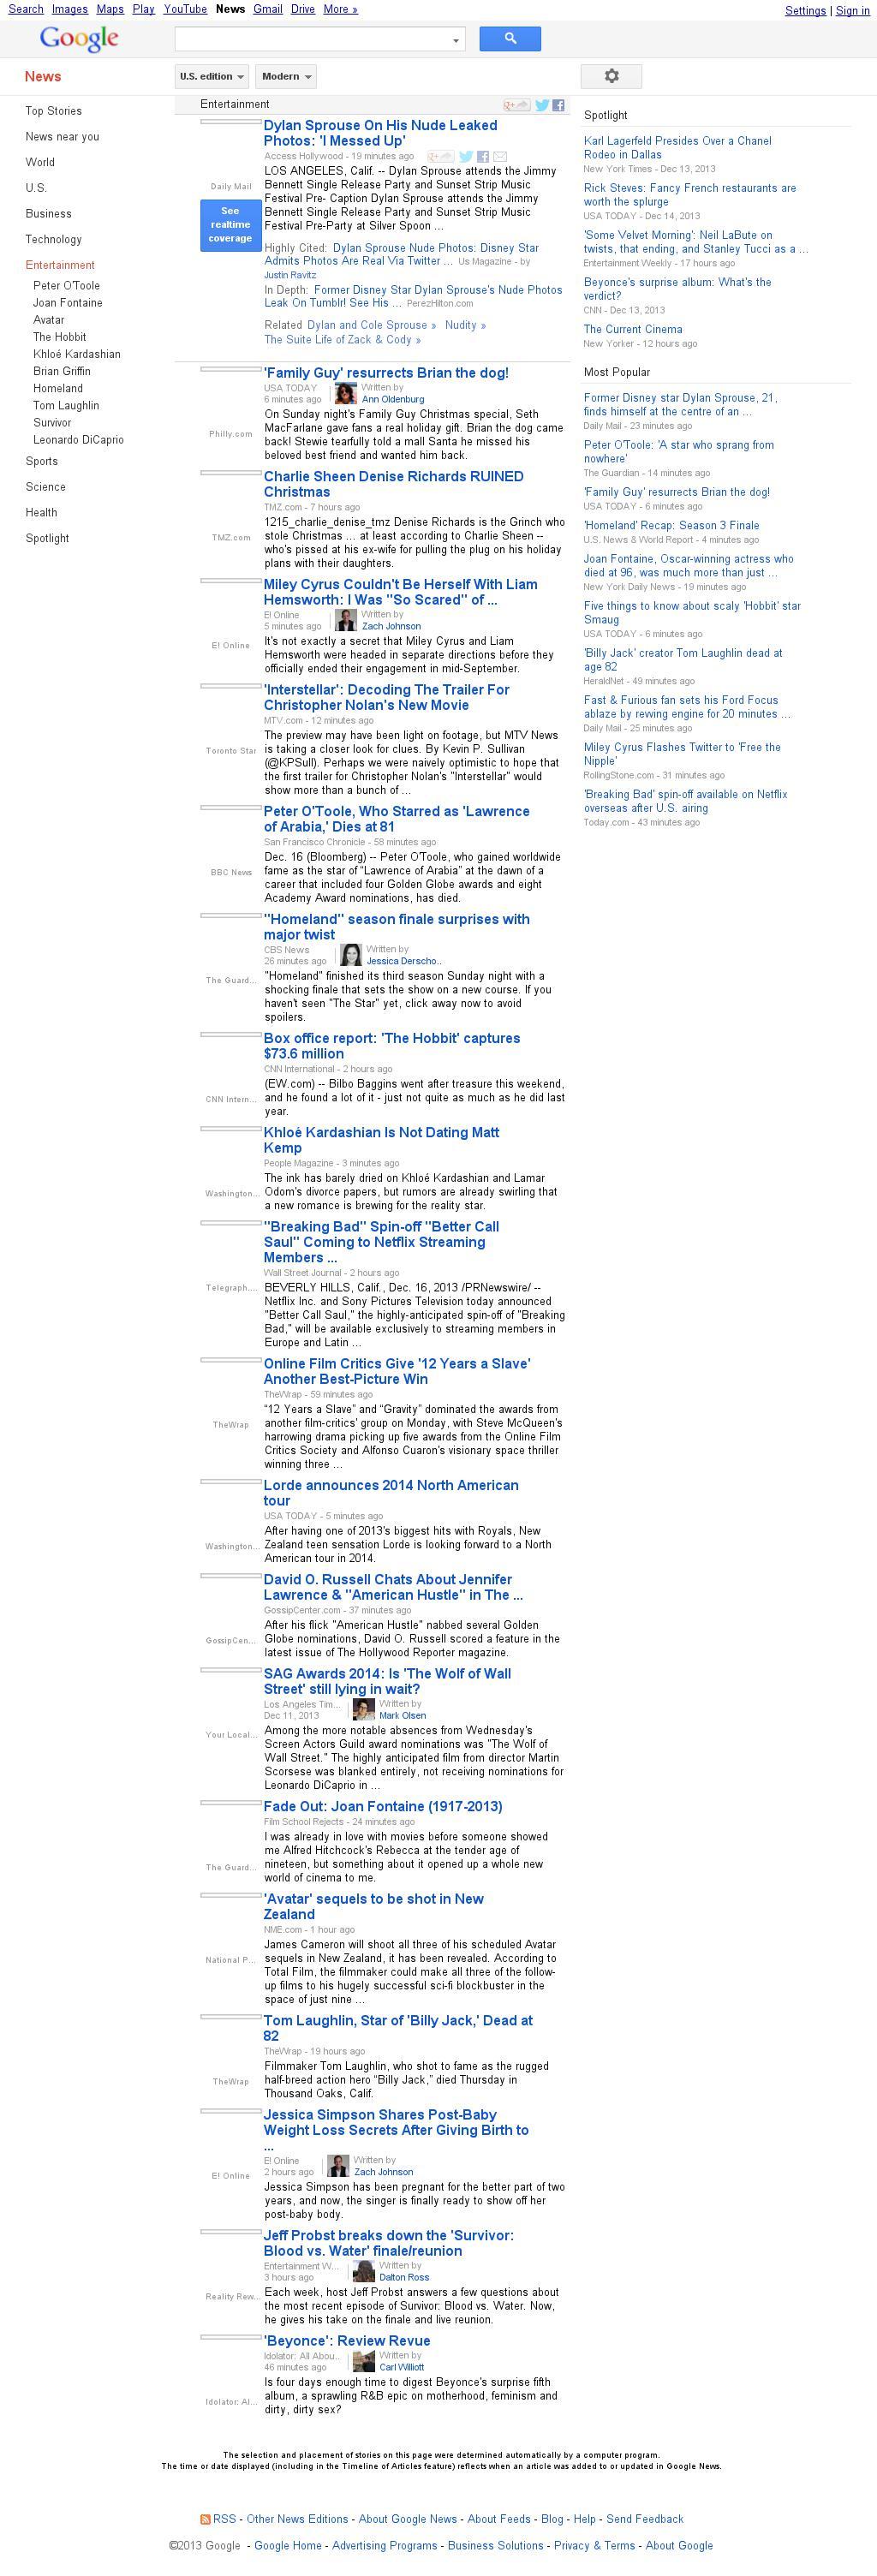 Google News: Entertainment at Monday Dec. 16, 2013, 5:06 p.m. UTC